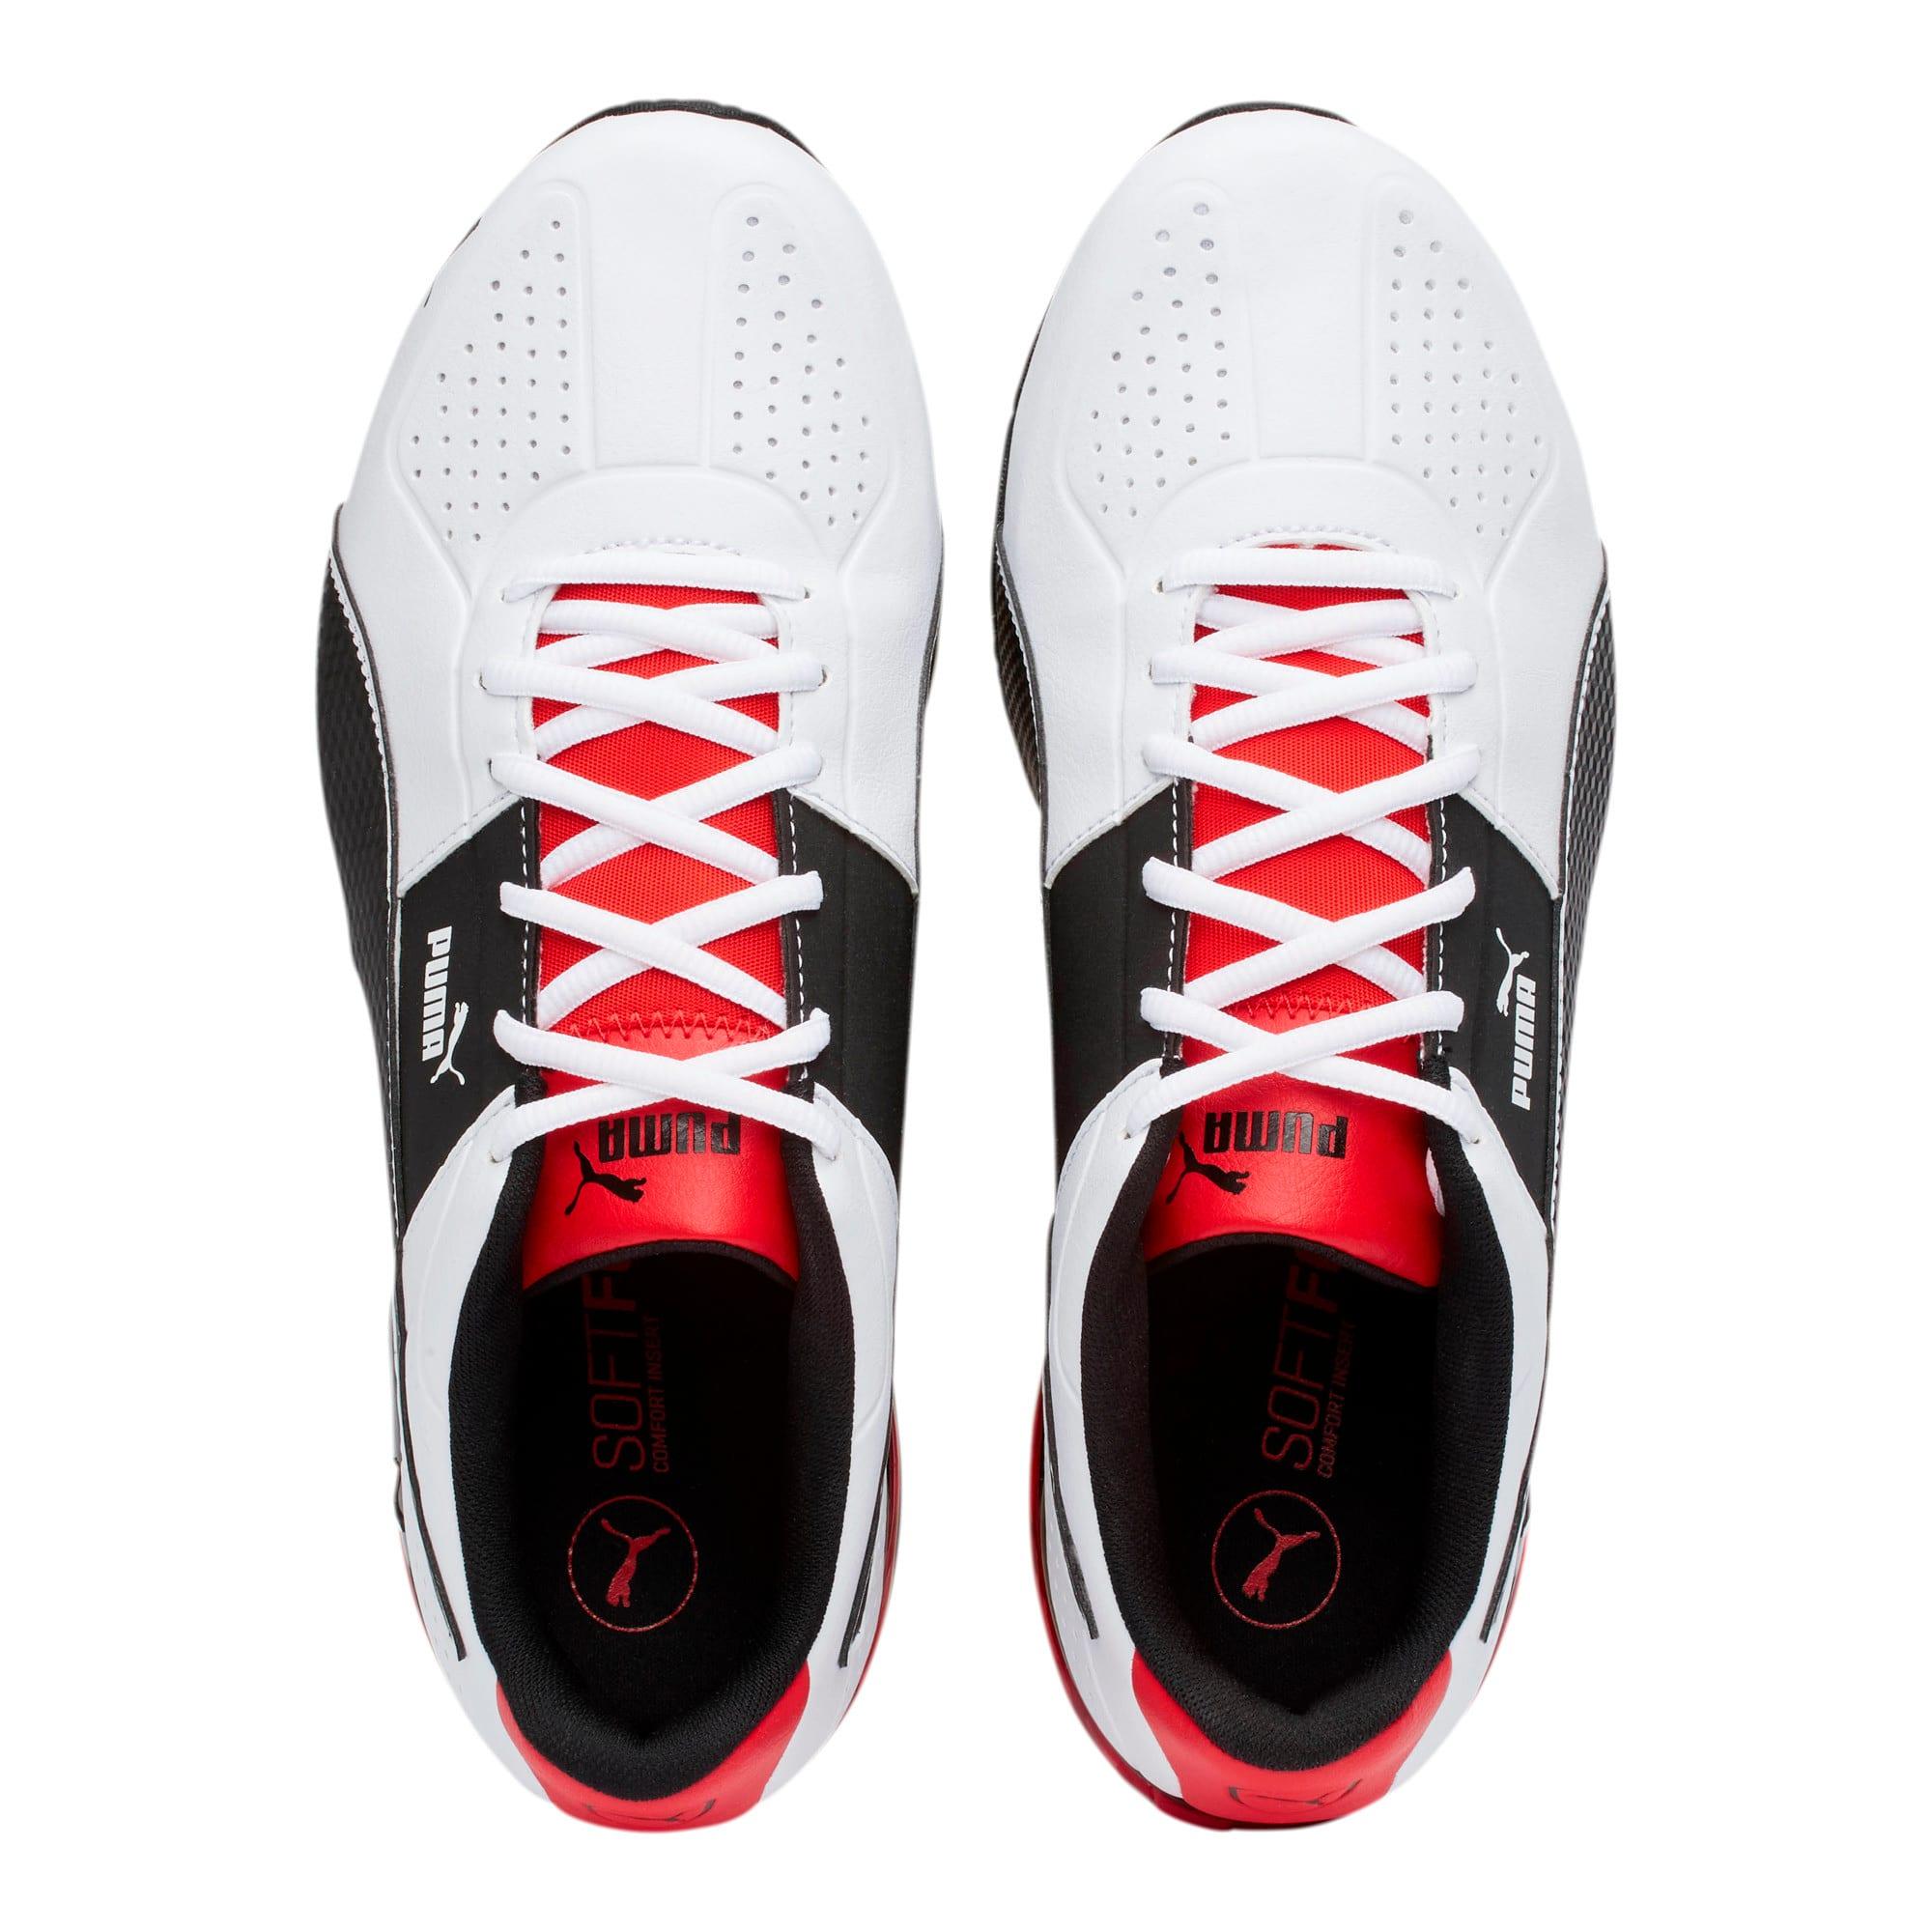 Thumbnail 6 of CELL Surin 2 FM Men's Running Shoes, White-Black-flame scarlet, medium